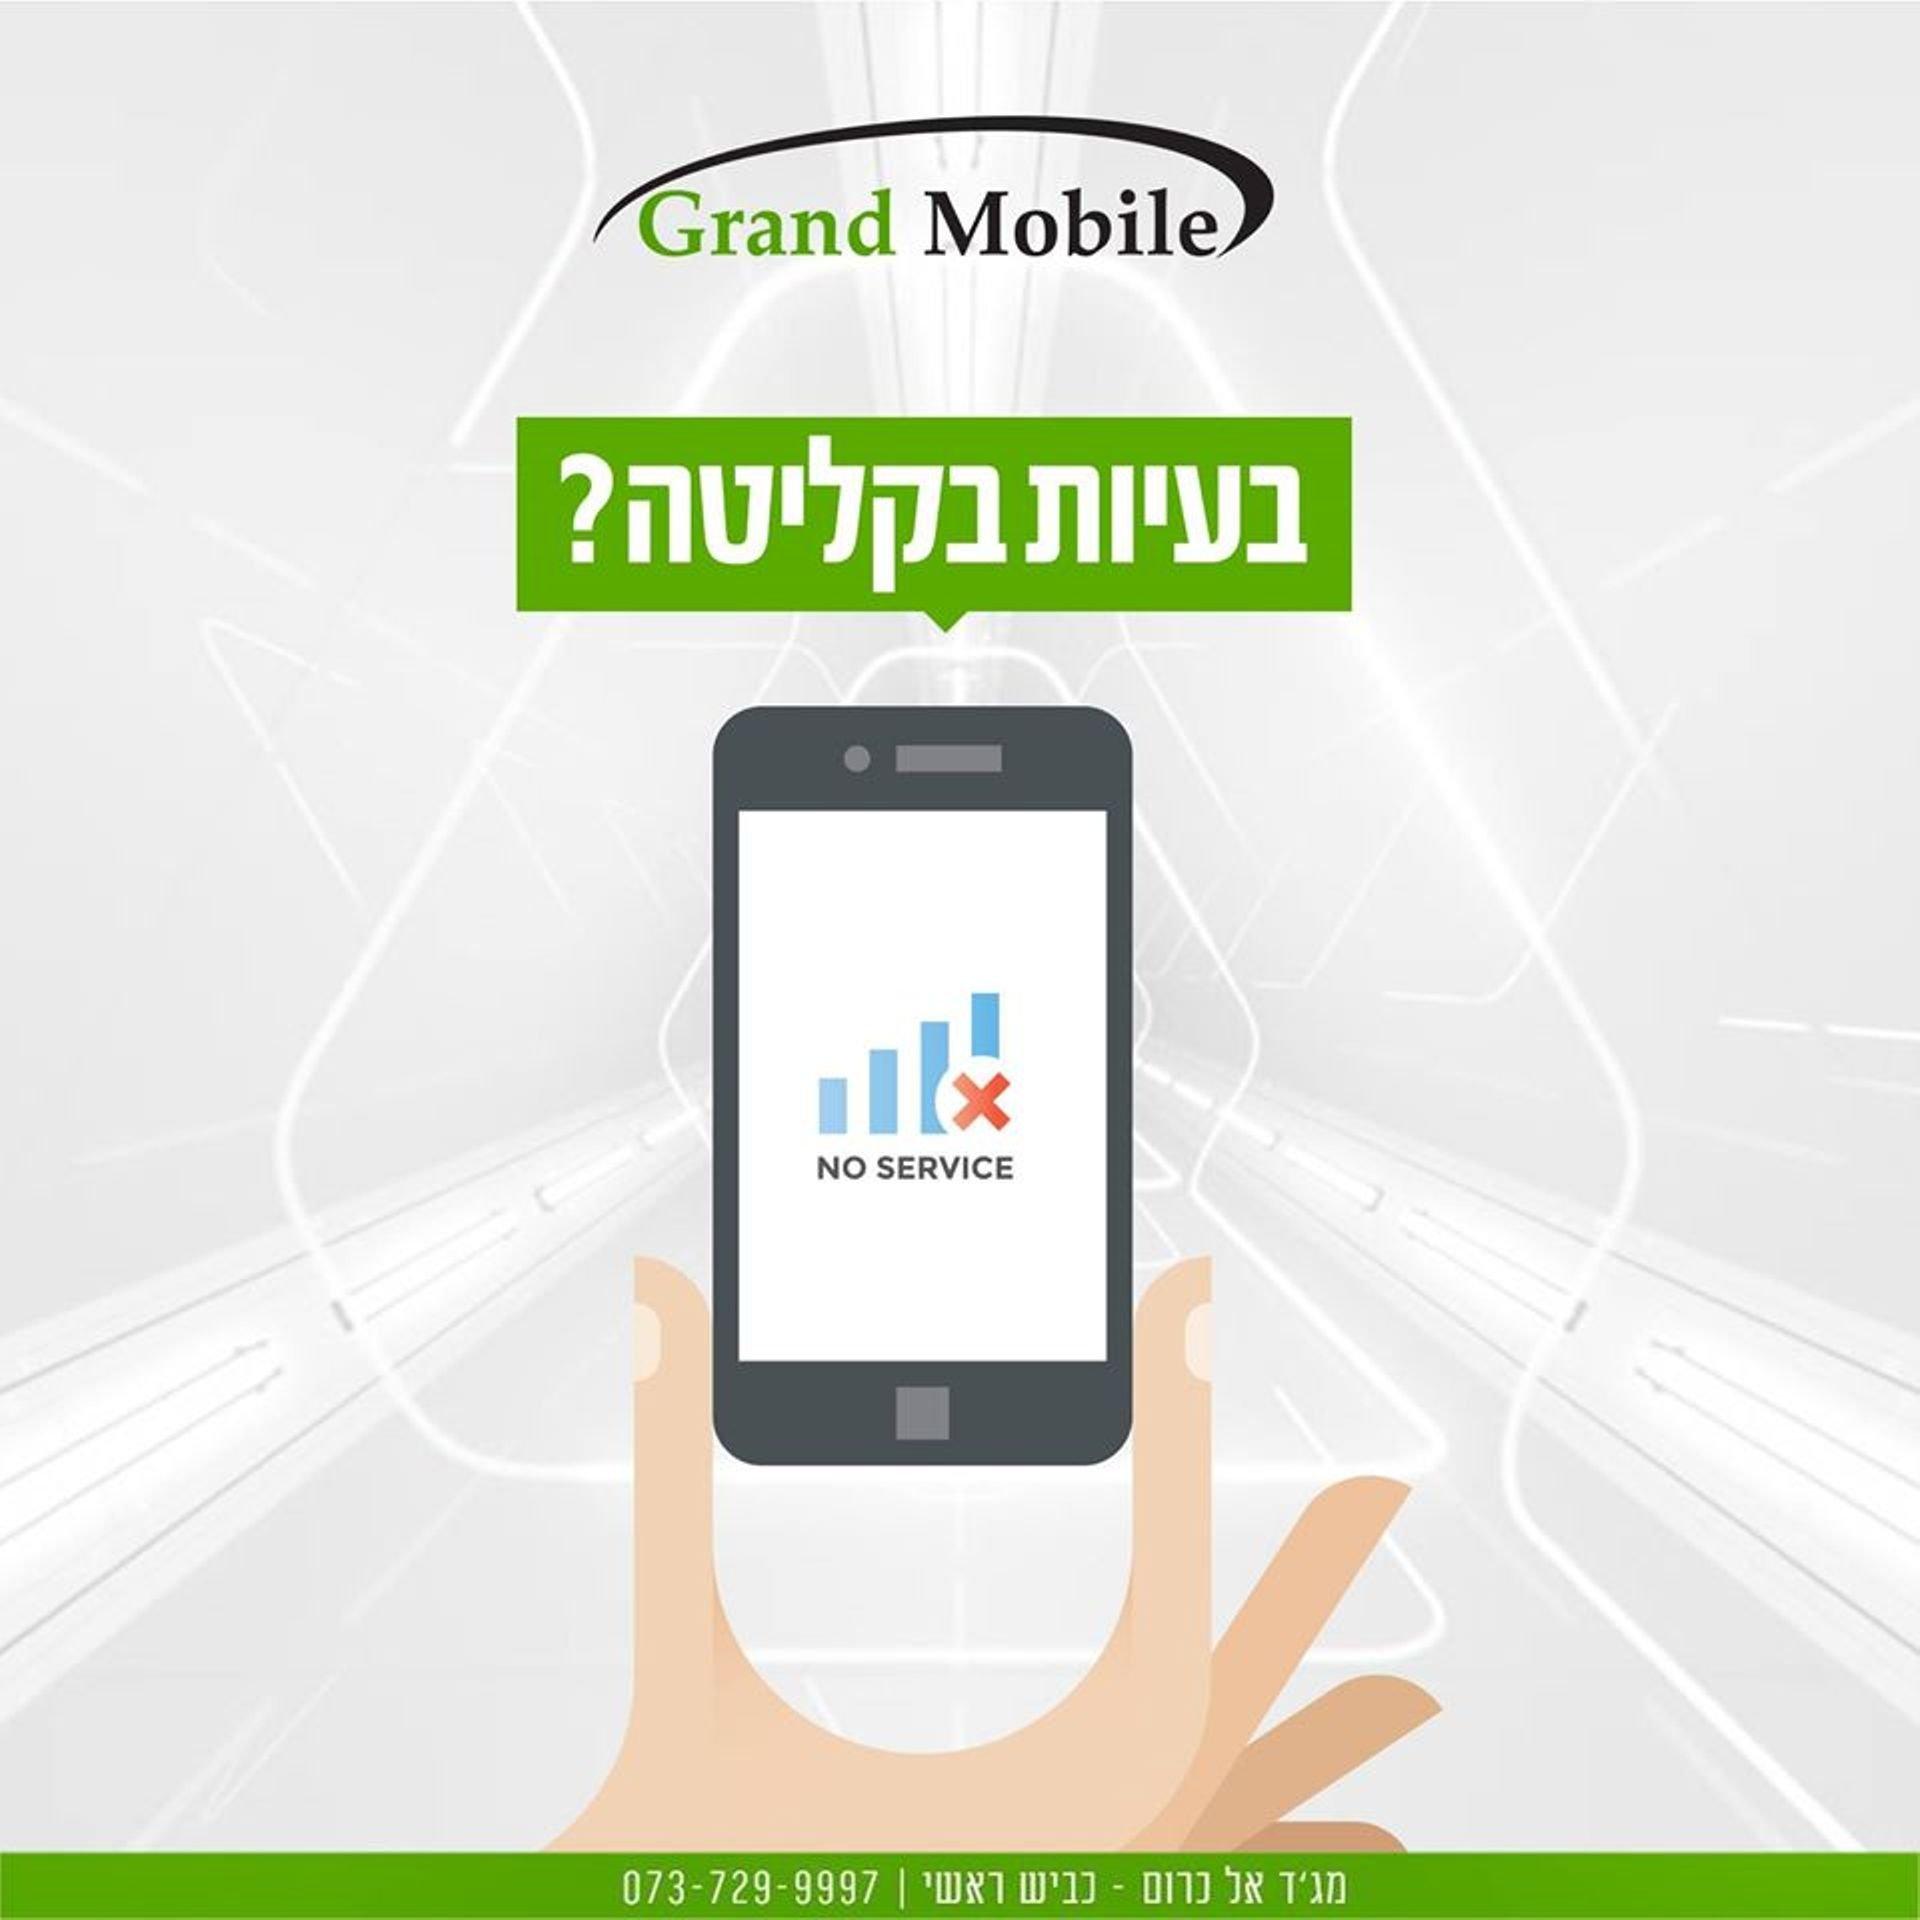 24 Grand mobile תְמוּנָה